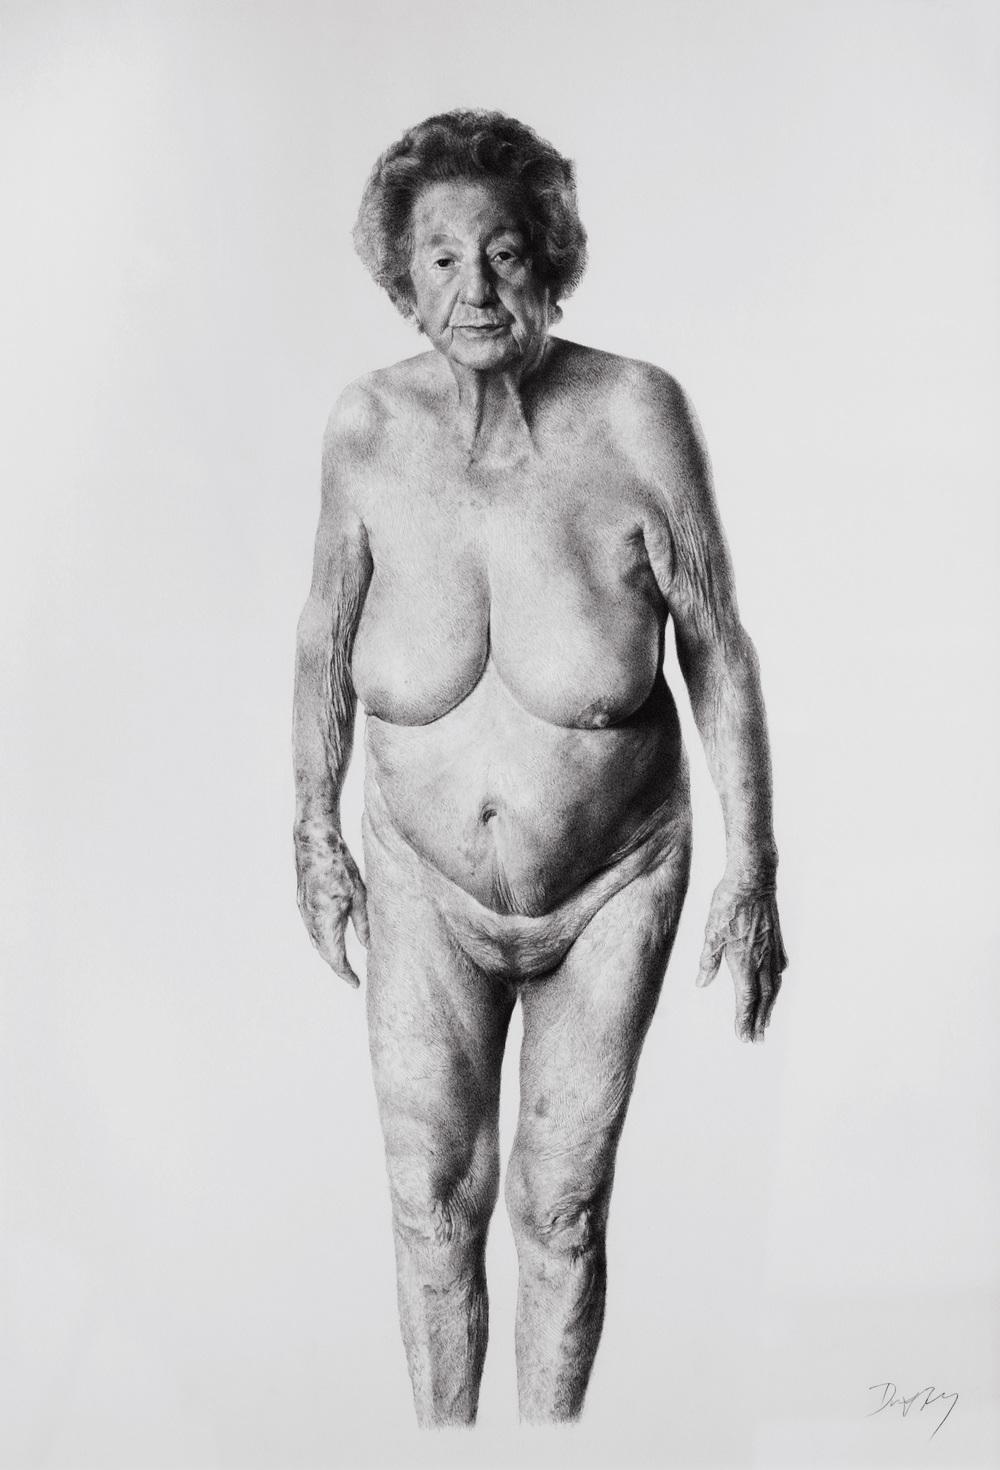 5-Helen-graphite-paper-14x24-35x61cm.jpg